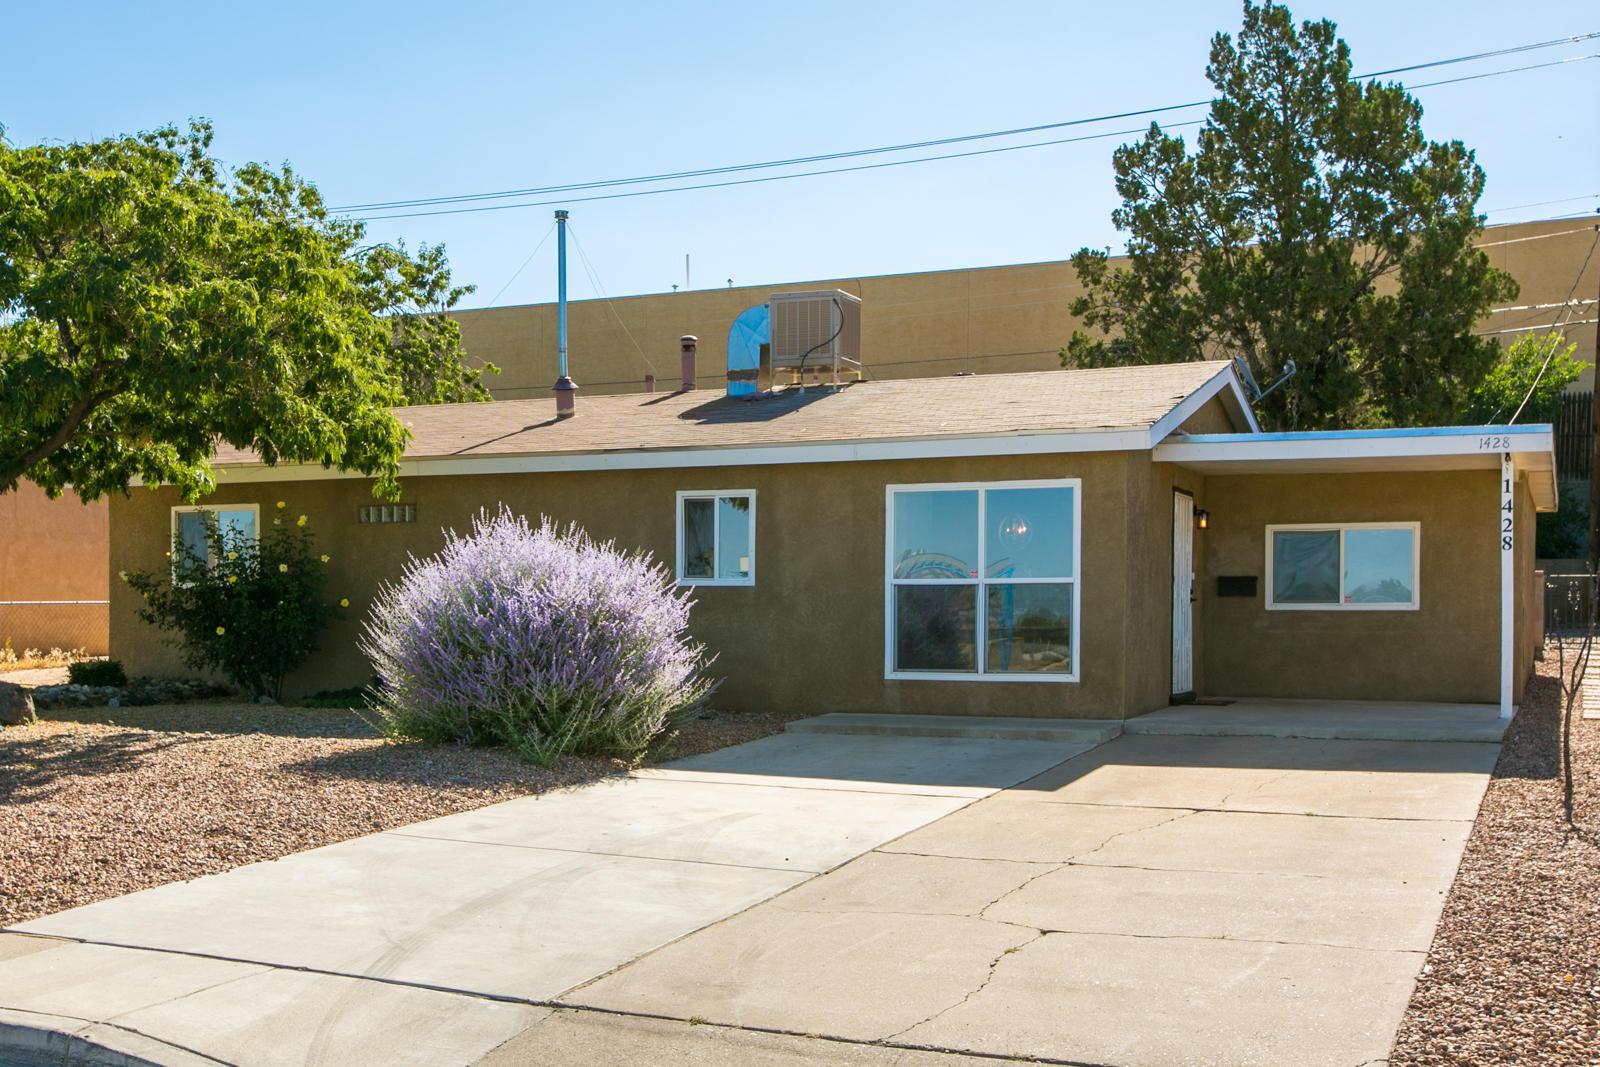 1428 MURIEL Street, Albuquerque NM 87112